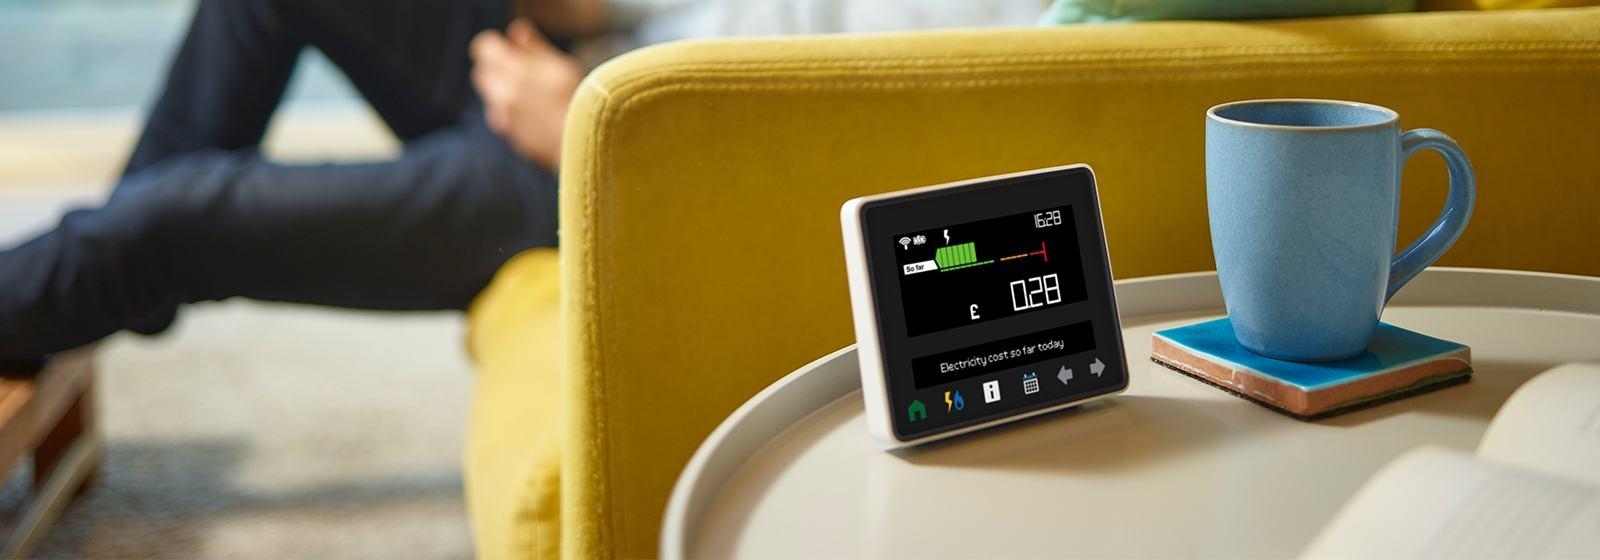 Guide for the Geo smart meter display | EDF Energy